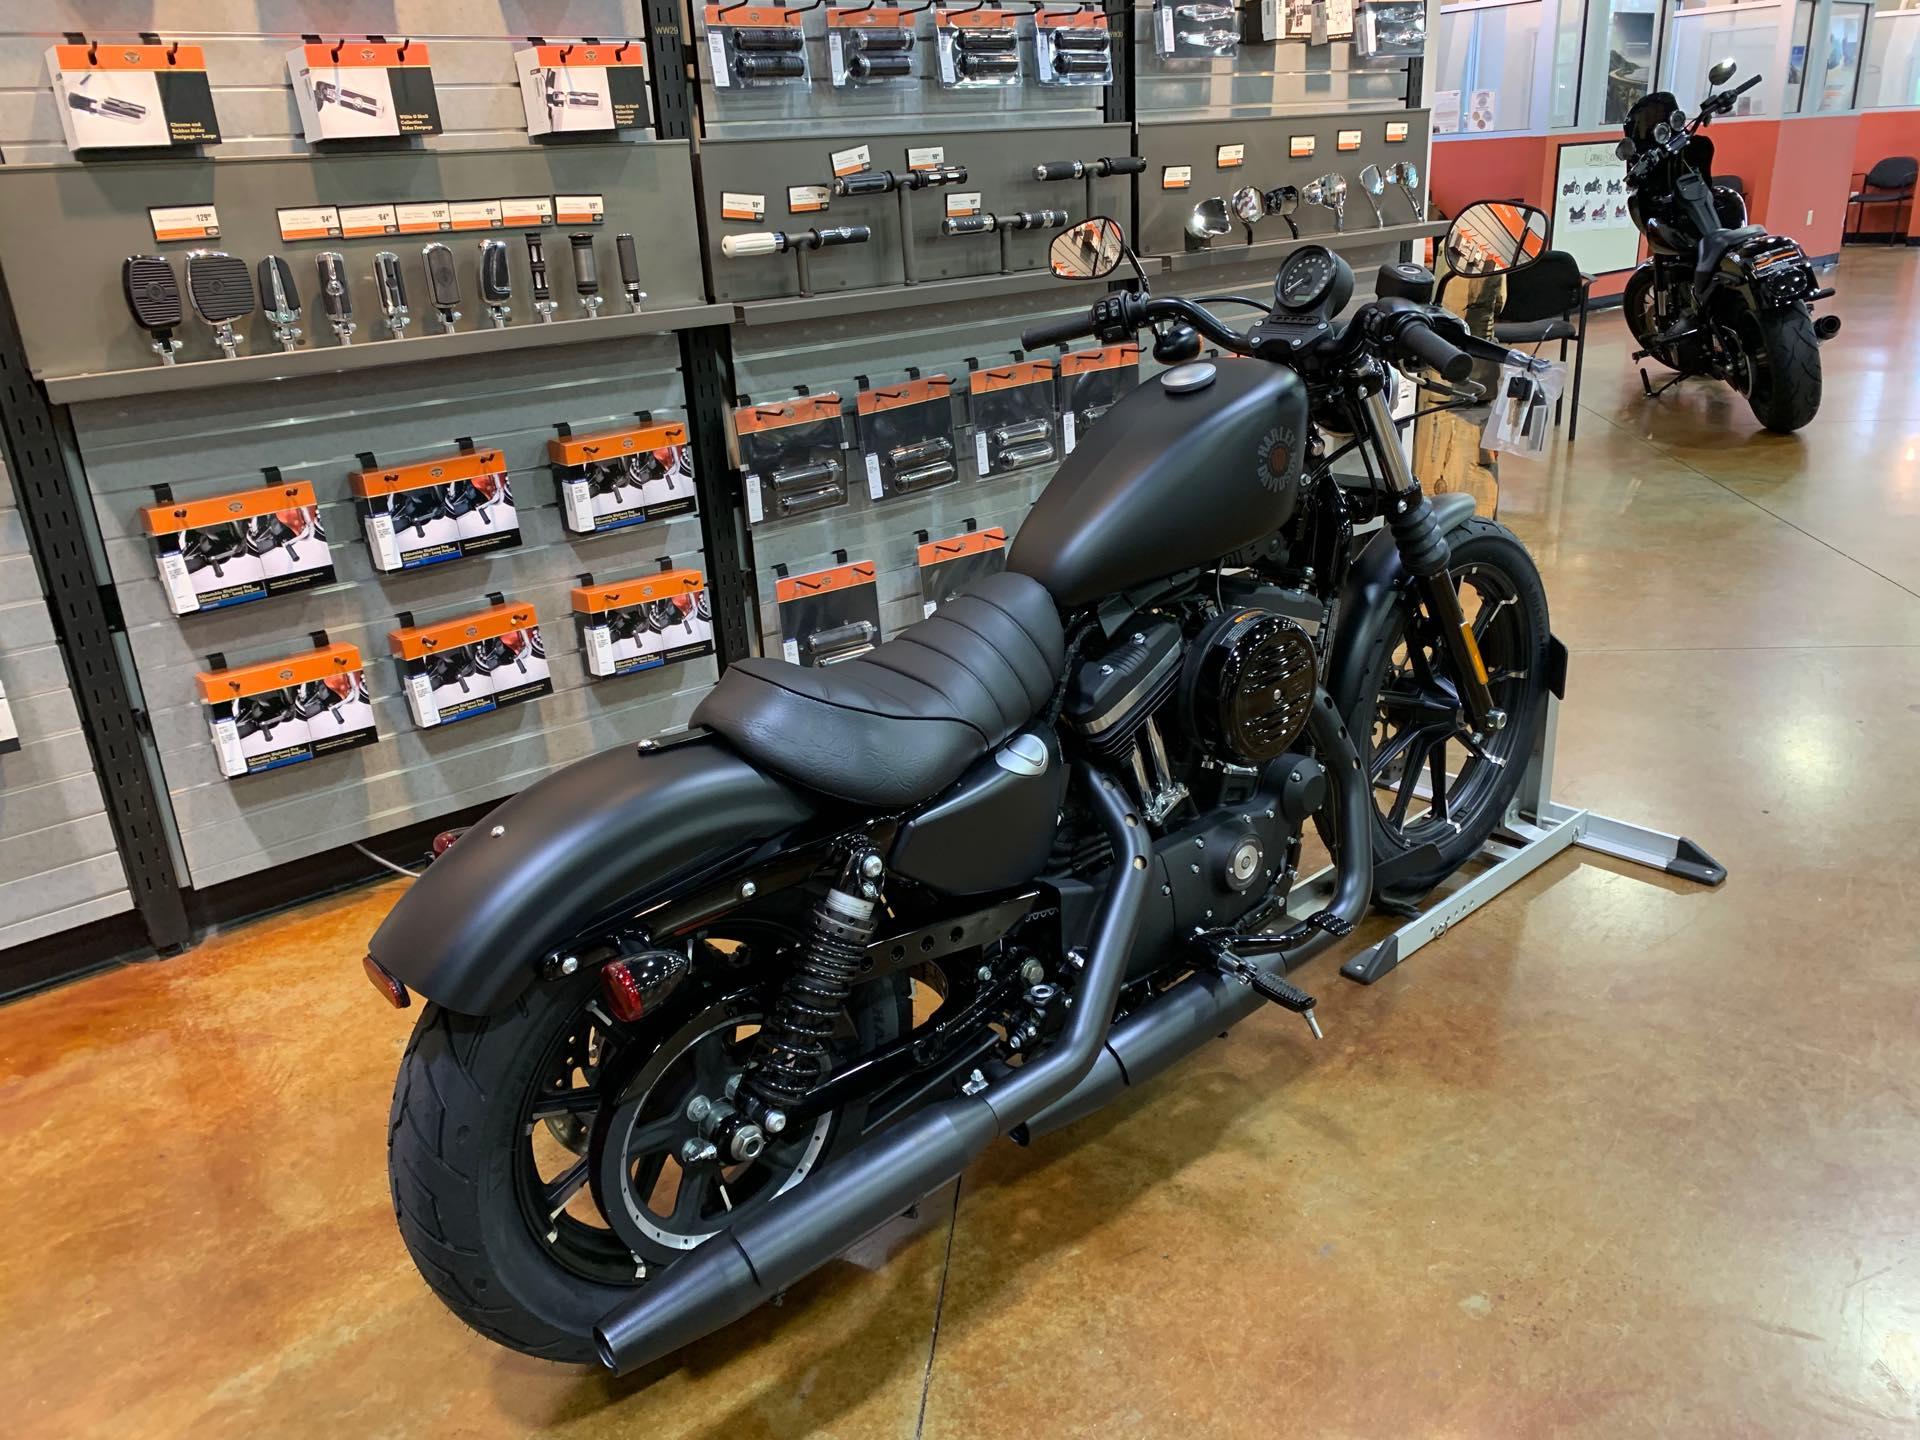 2021 Harley-Davidson Cruiser XL 883N Iron 883 at Colonial Harley-Davidson